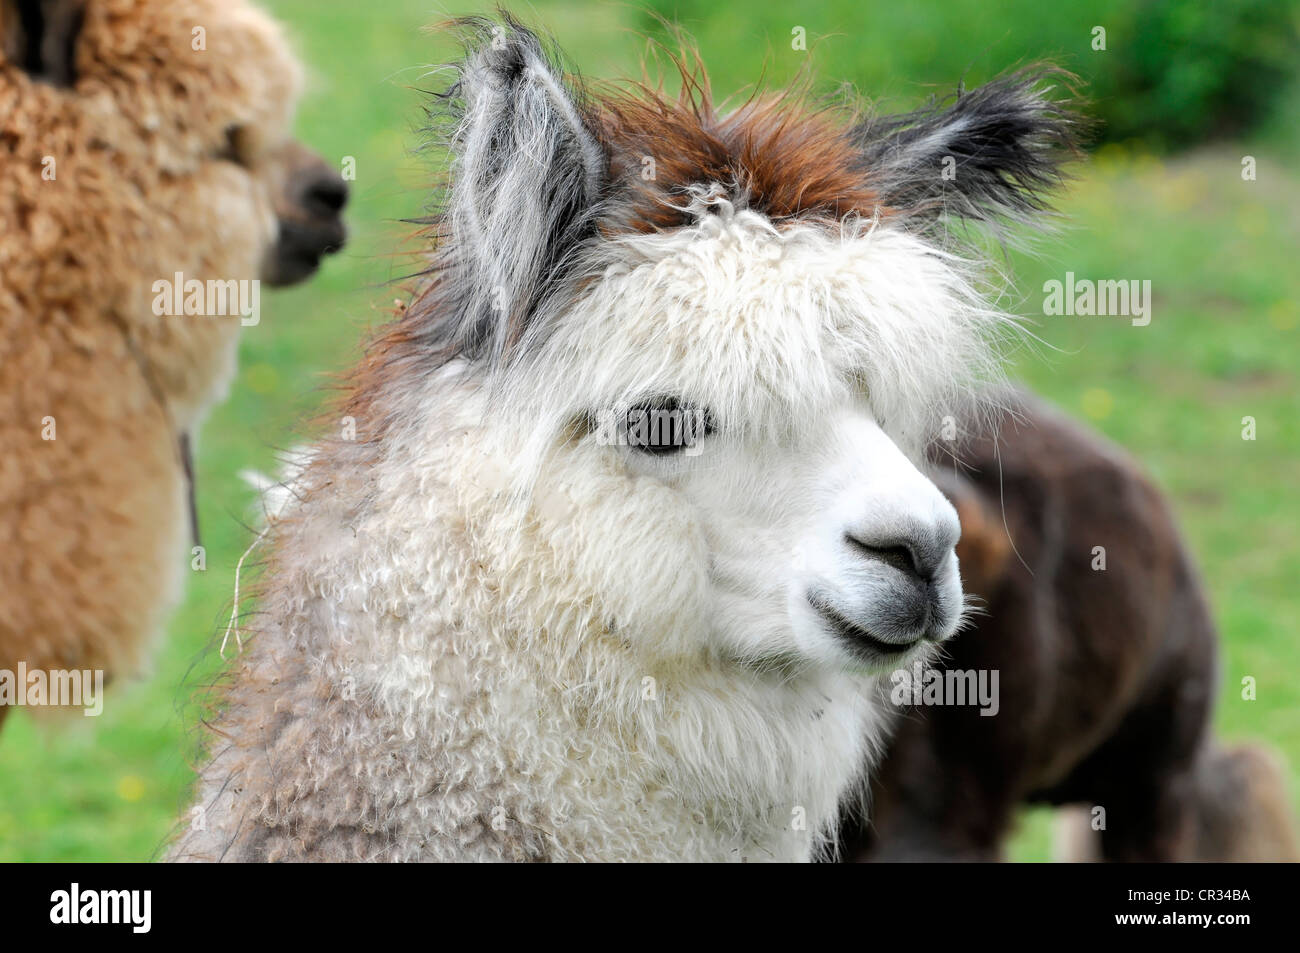 Alpacas (Lama pacos), alpaca breeding, Schwaebisch Gmuend, Baden-Wuerttemberg, Germany, Europe - Stock Image